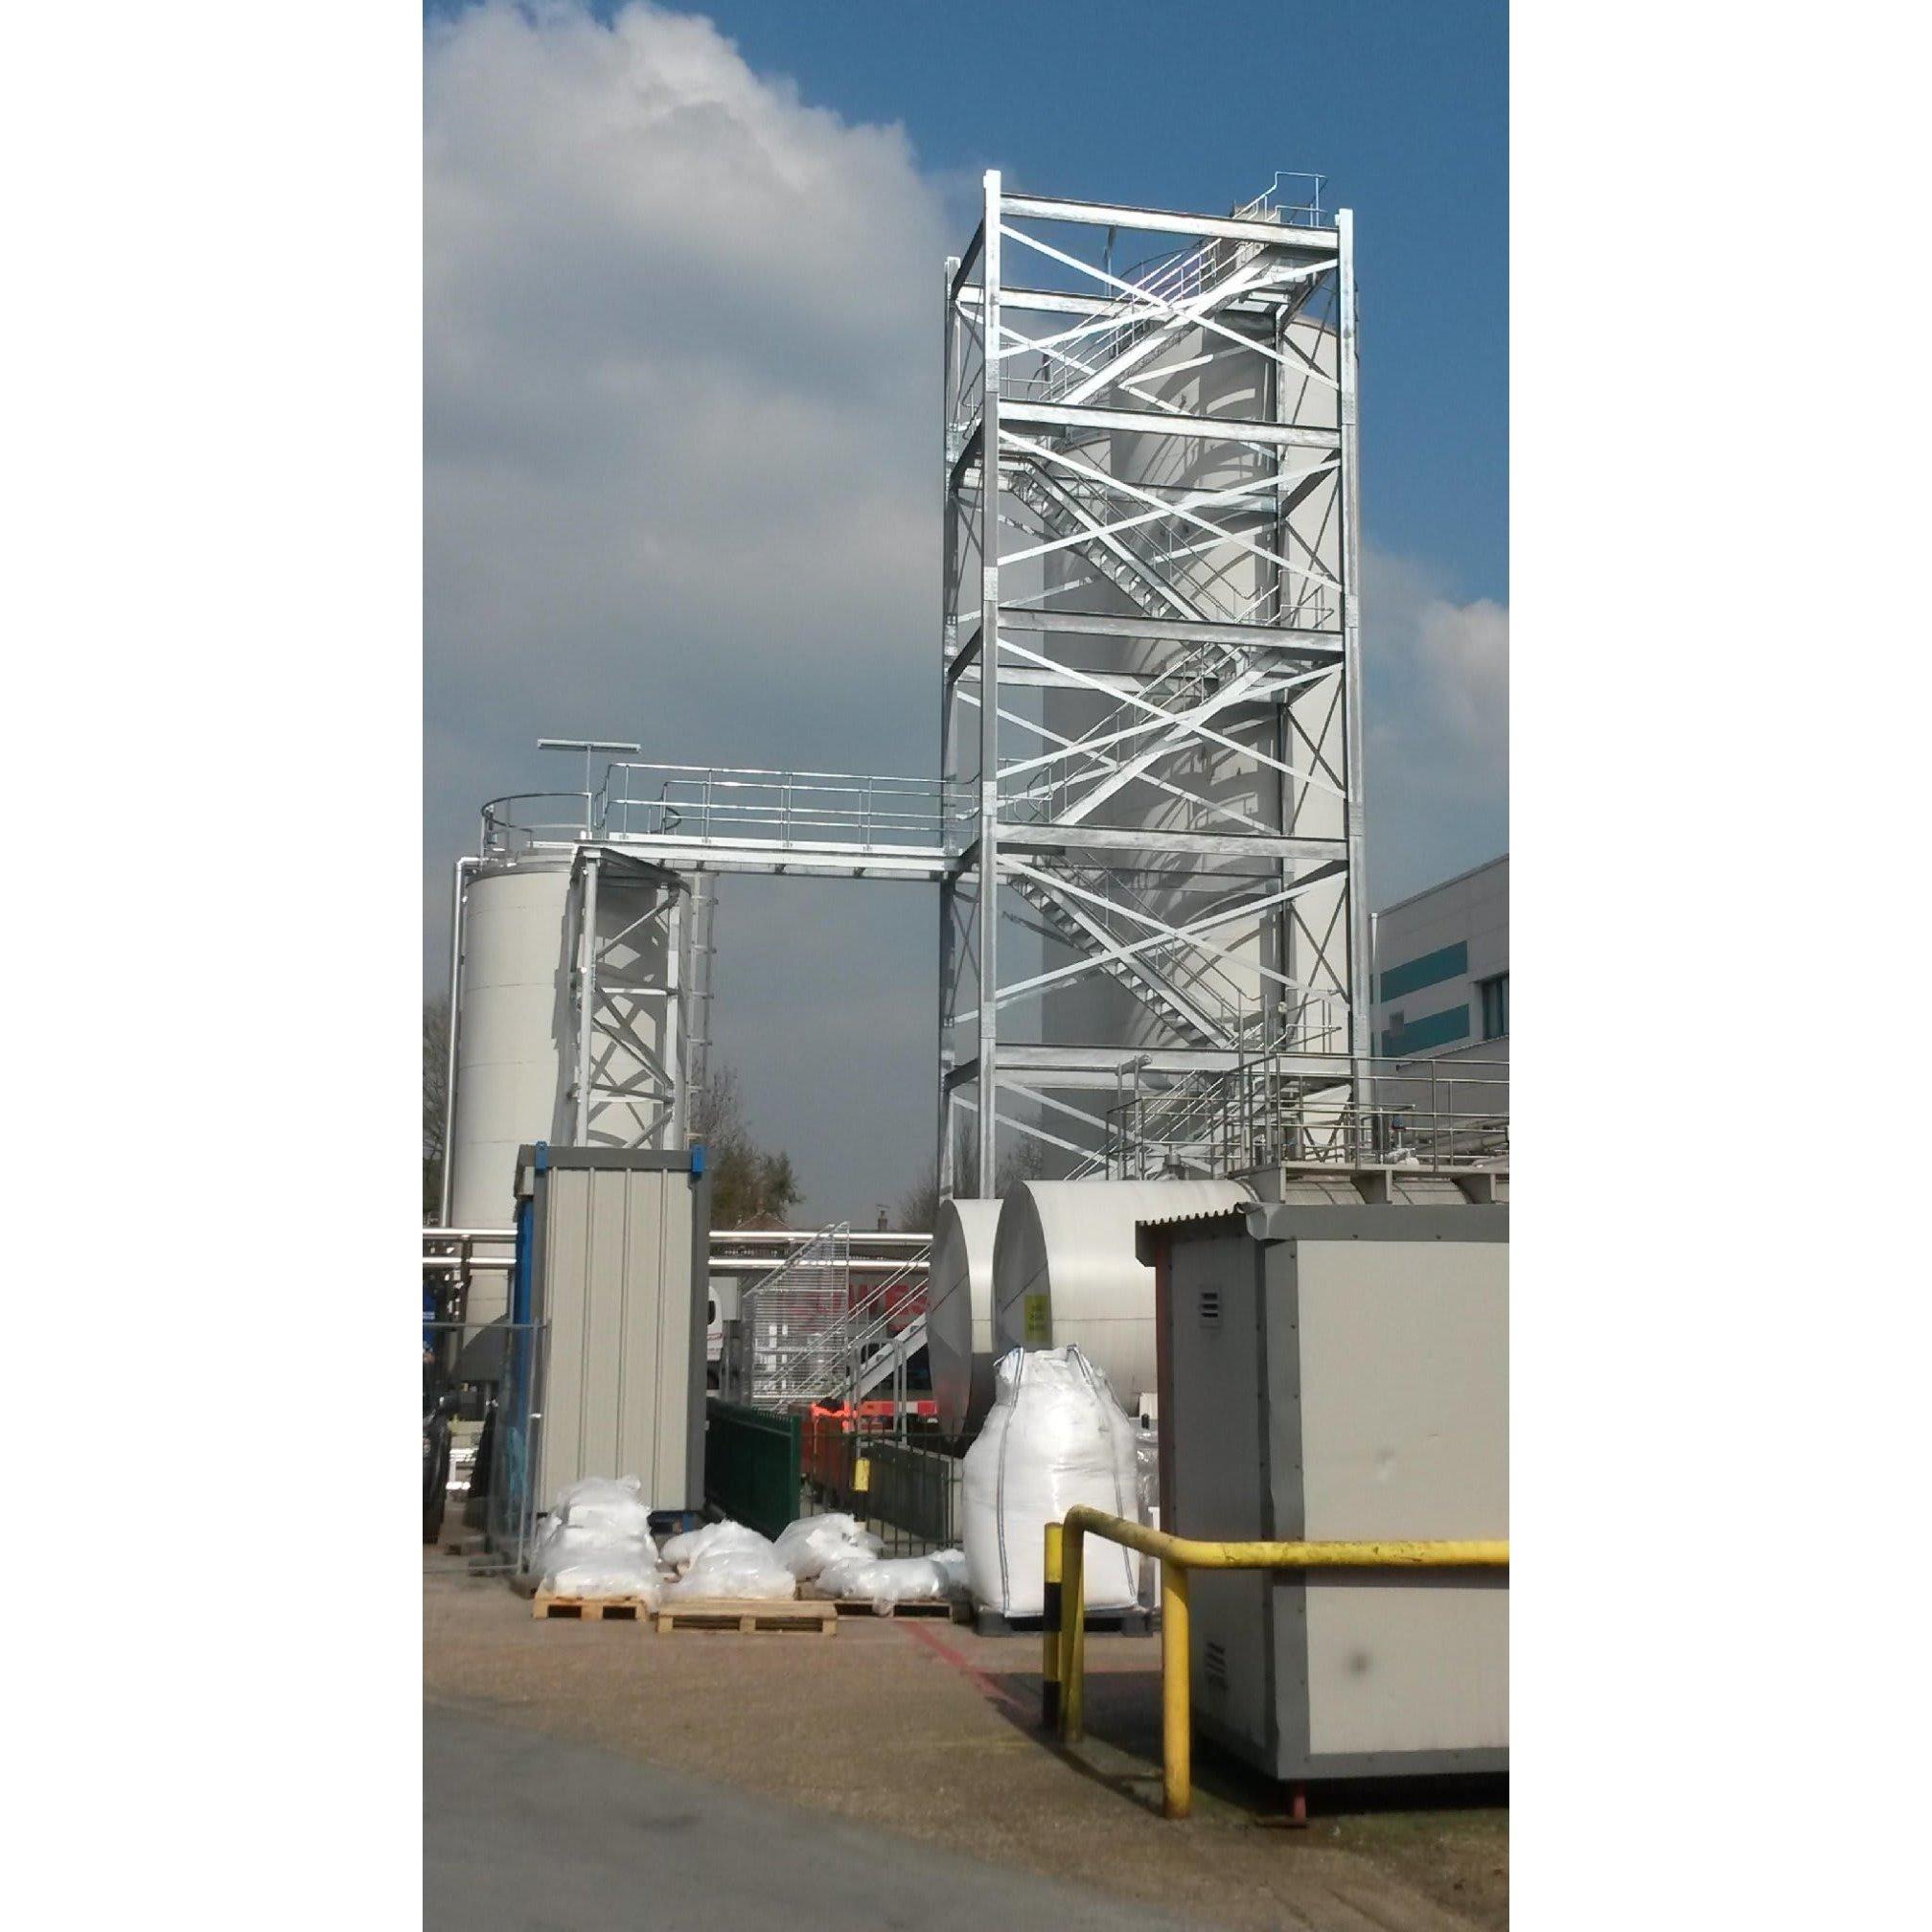 Millwright Engineering Ltd - High Wycombe, Buckinghamshire HP10 0PF - 01628 850911 | ShowMeLocal.com